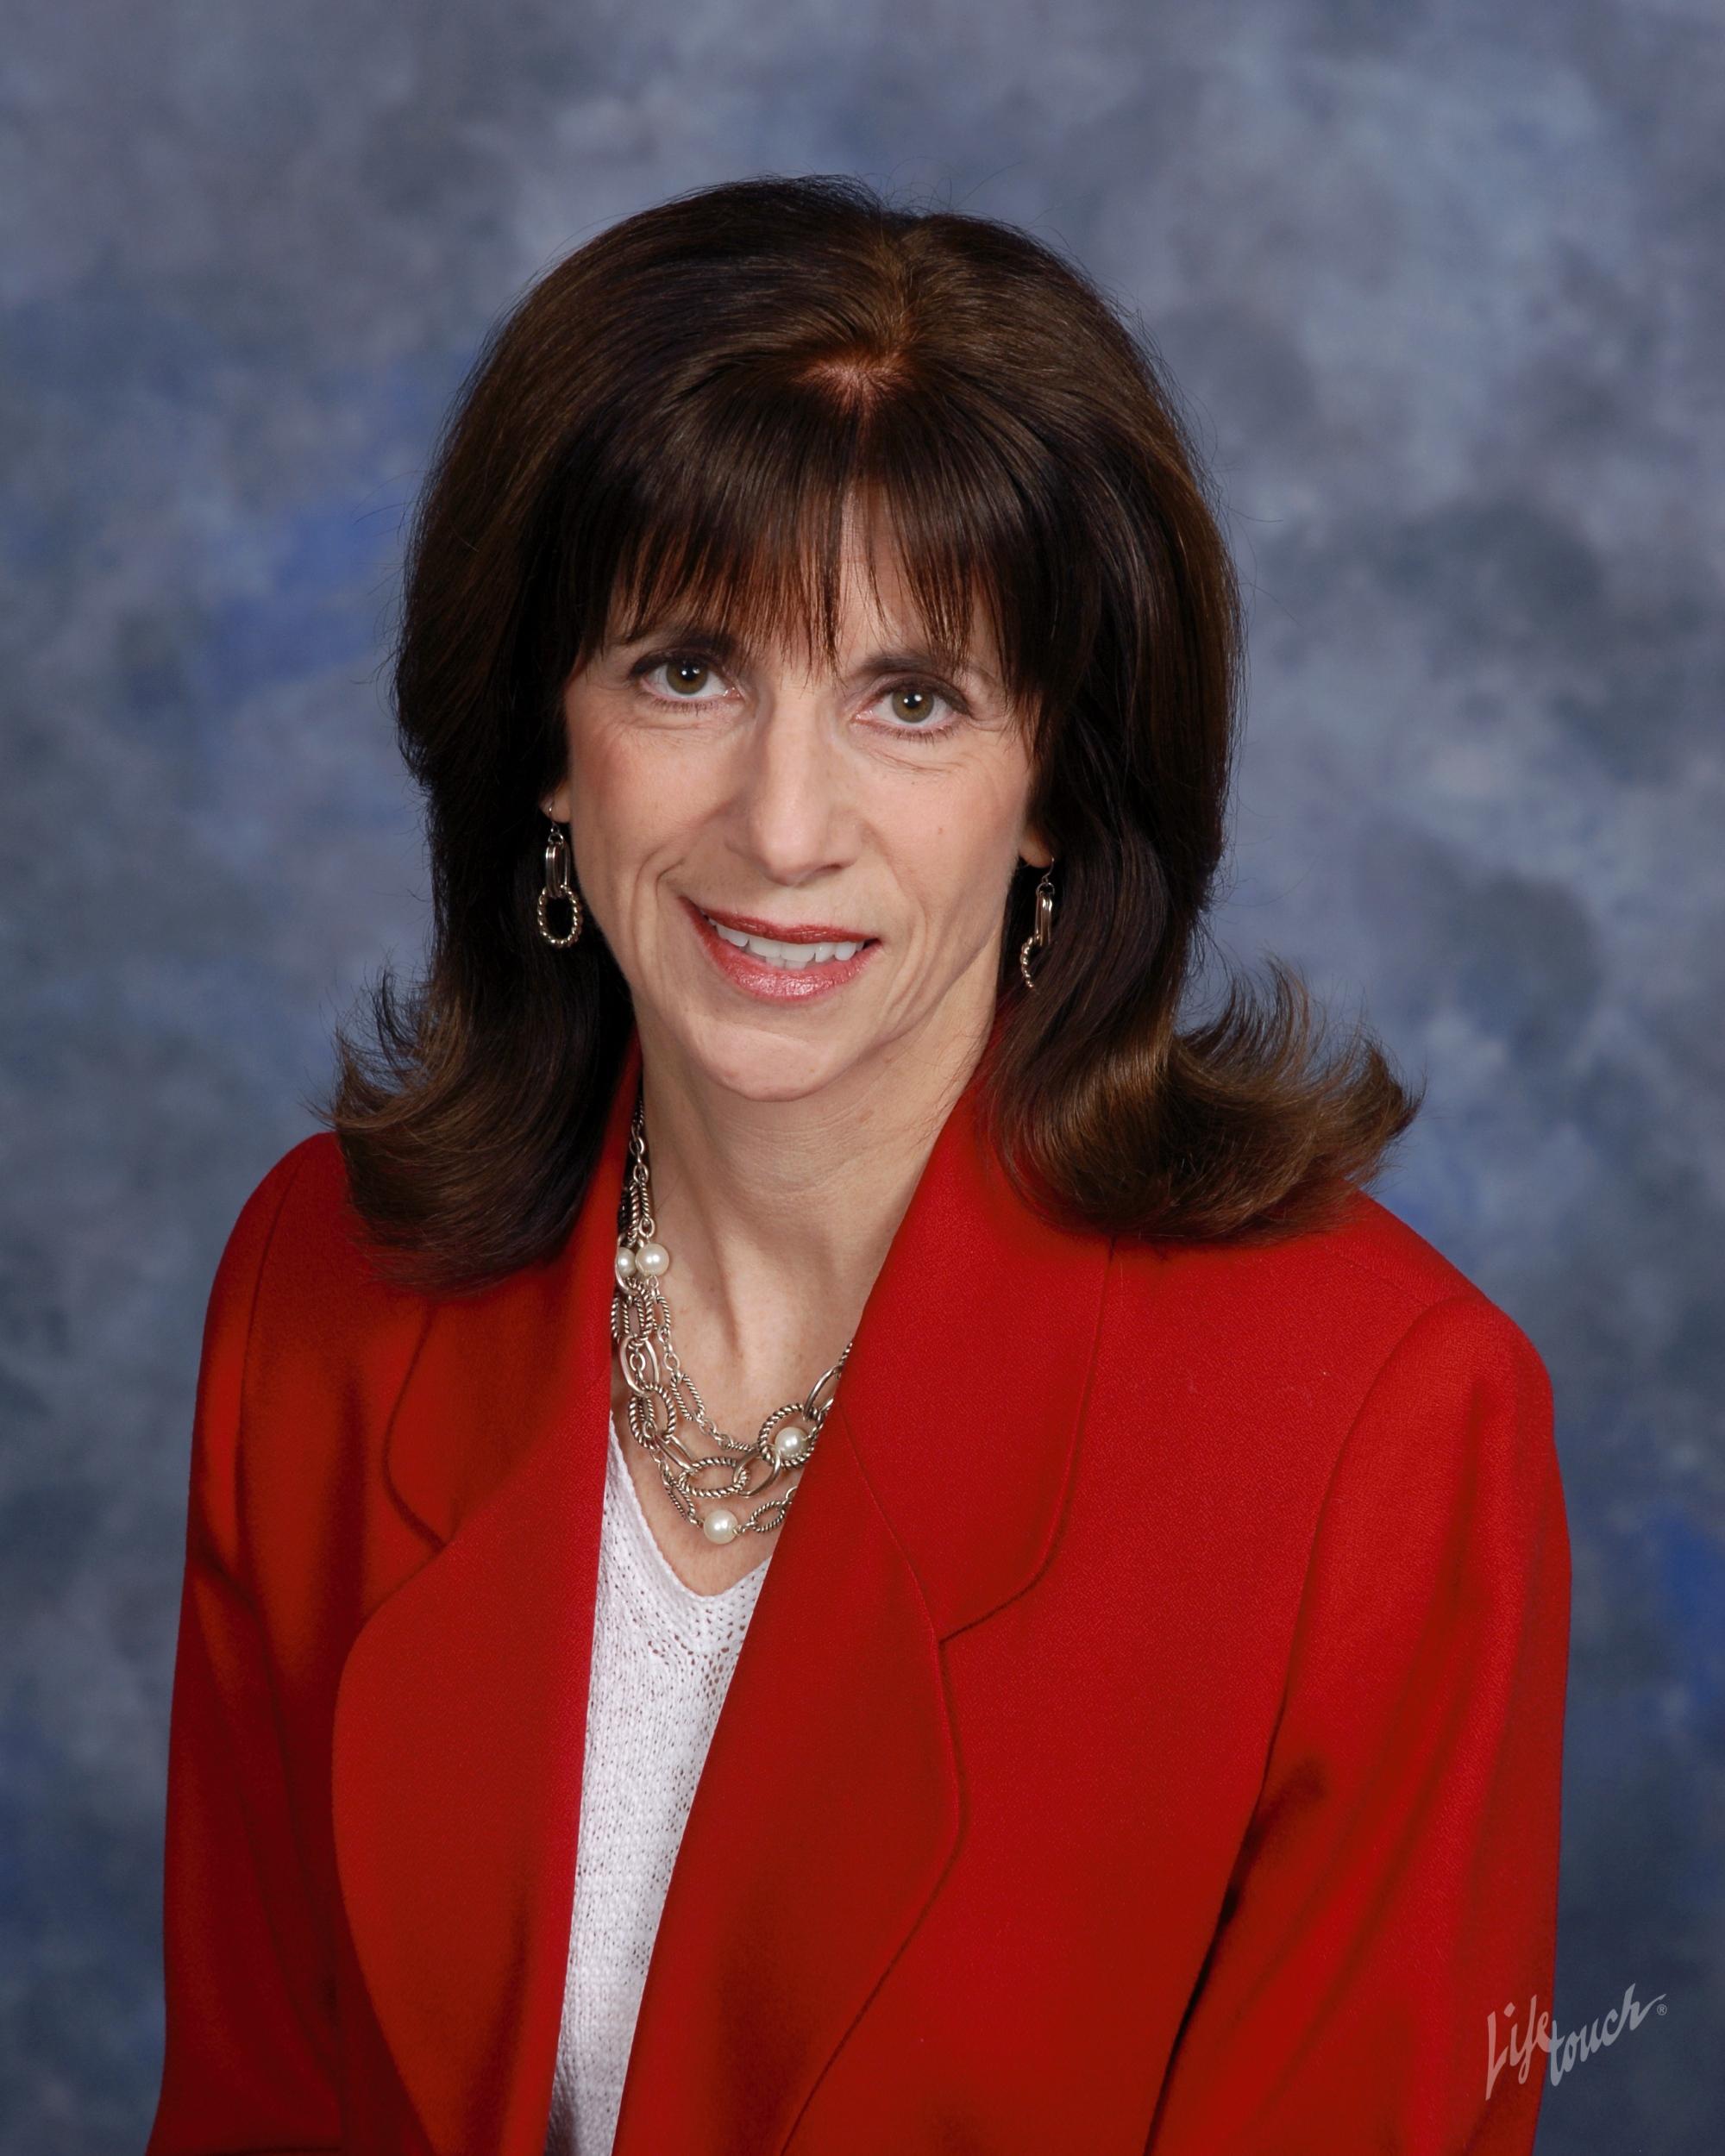 Debbie Fledderjohann